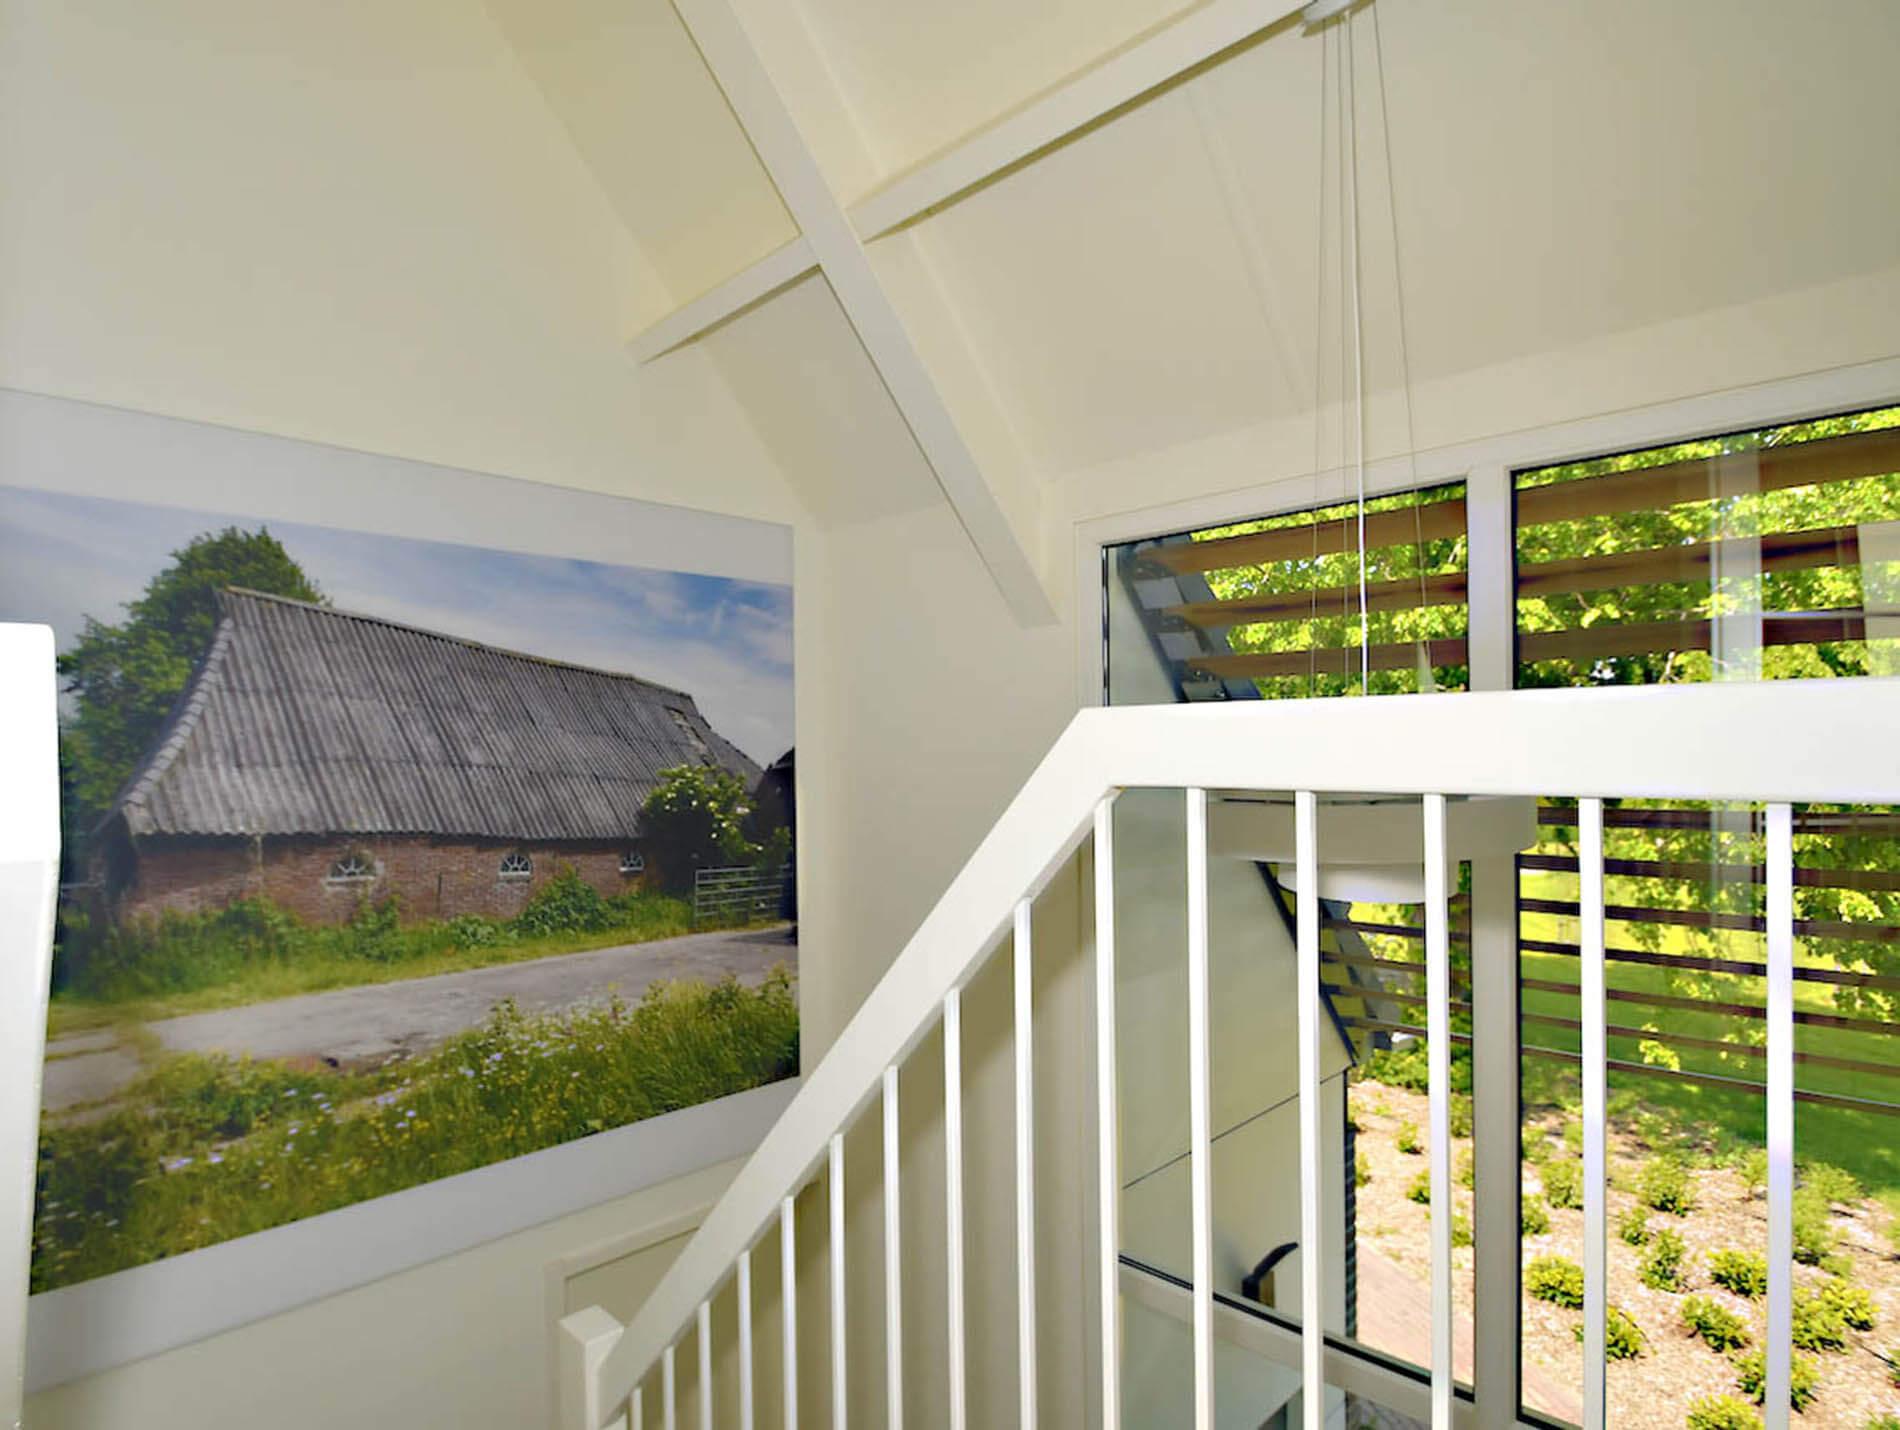 1. interieur-wijnjewouden-particuliere-woning-1900x1430p.jpg